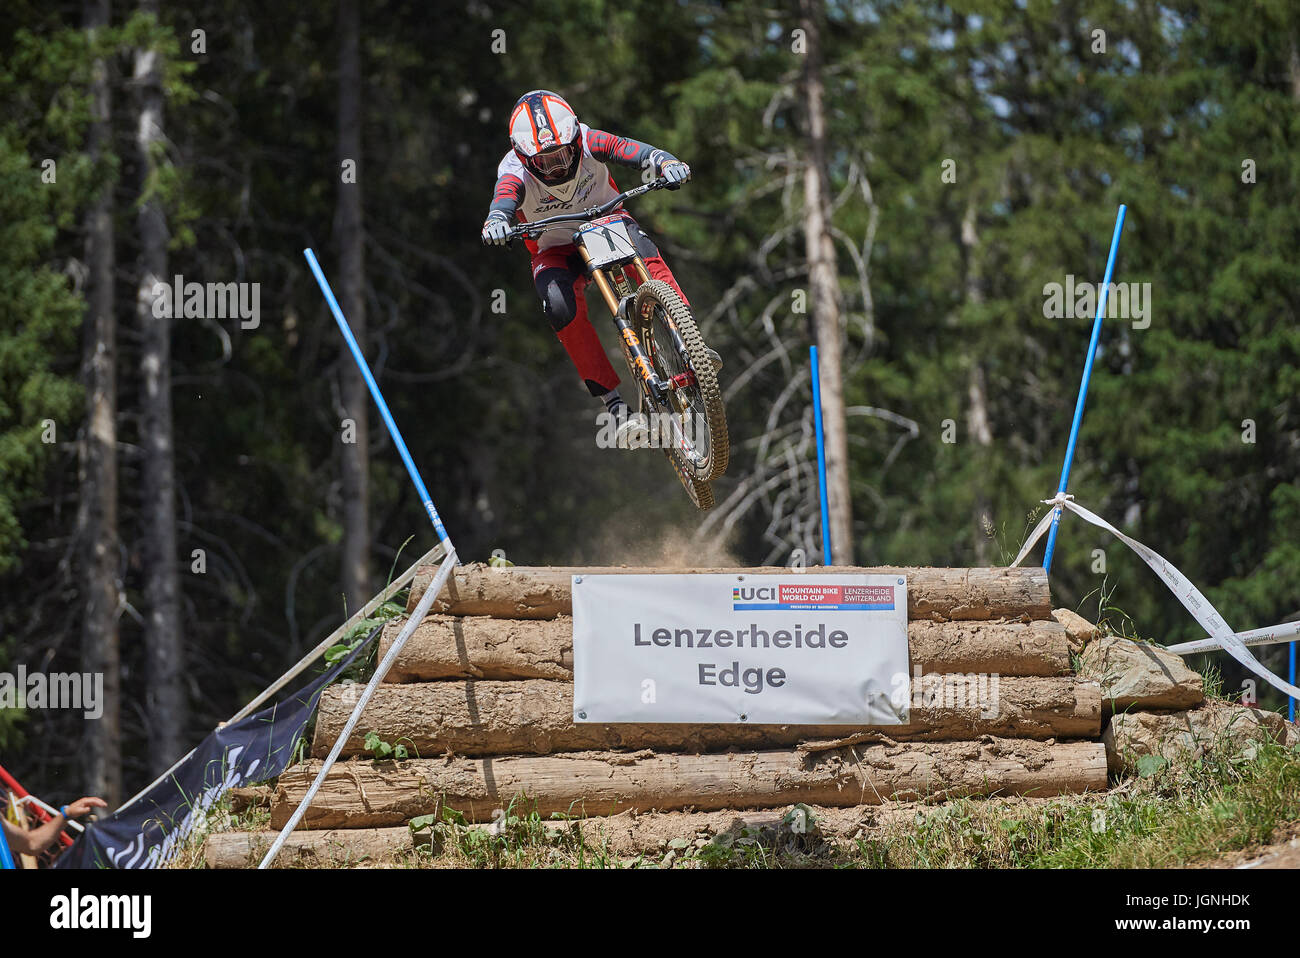 Lenzerheide, Switzerland. 7 July 2017. Greg Minnaar from SANTA CRUZ SYNDICATE during the UCI Mountain Bike Downhill - Stock Image